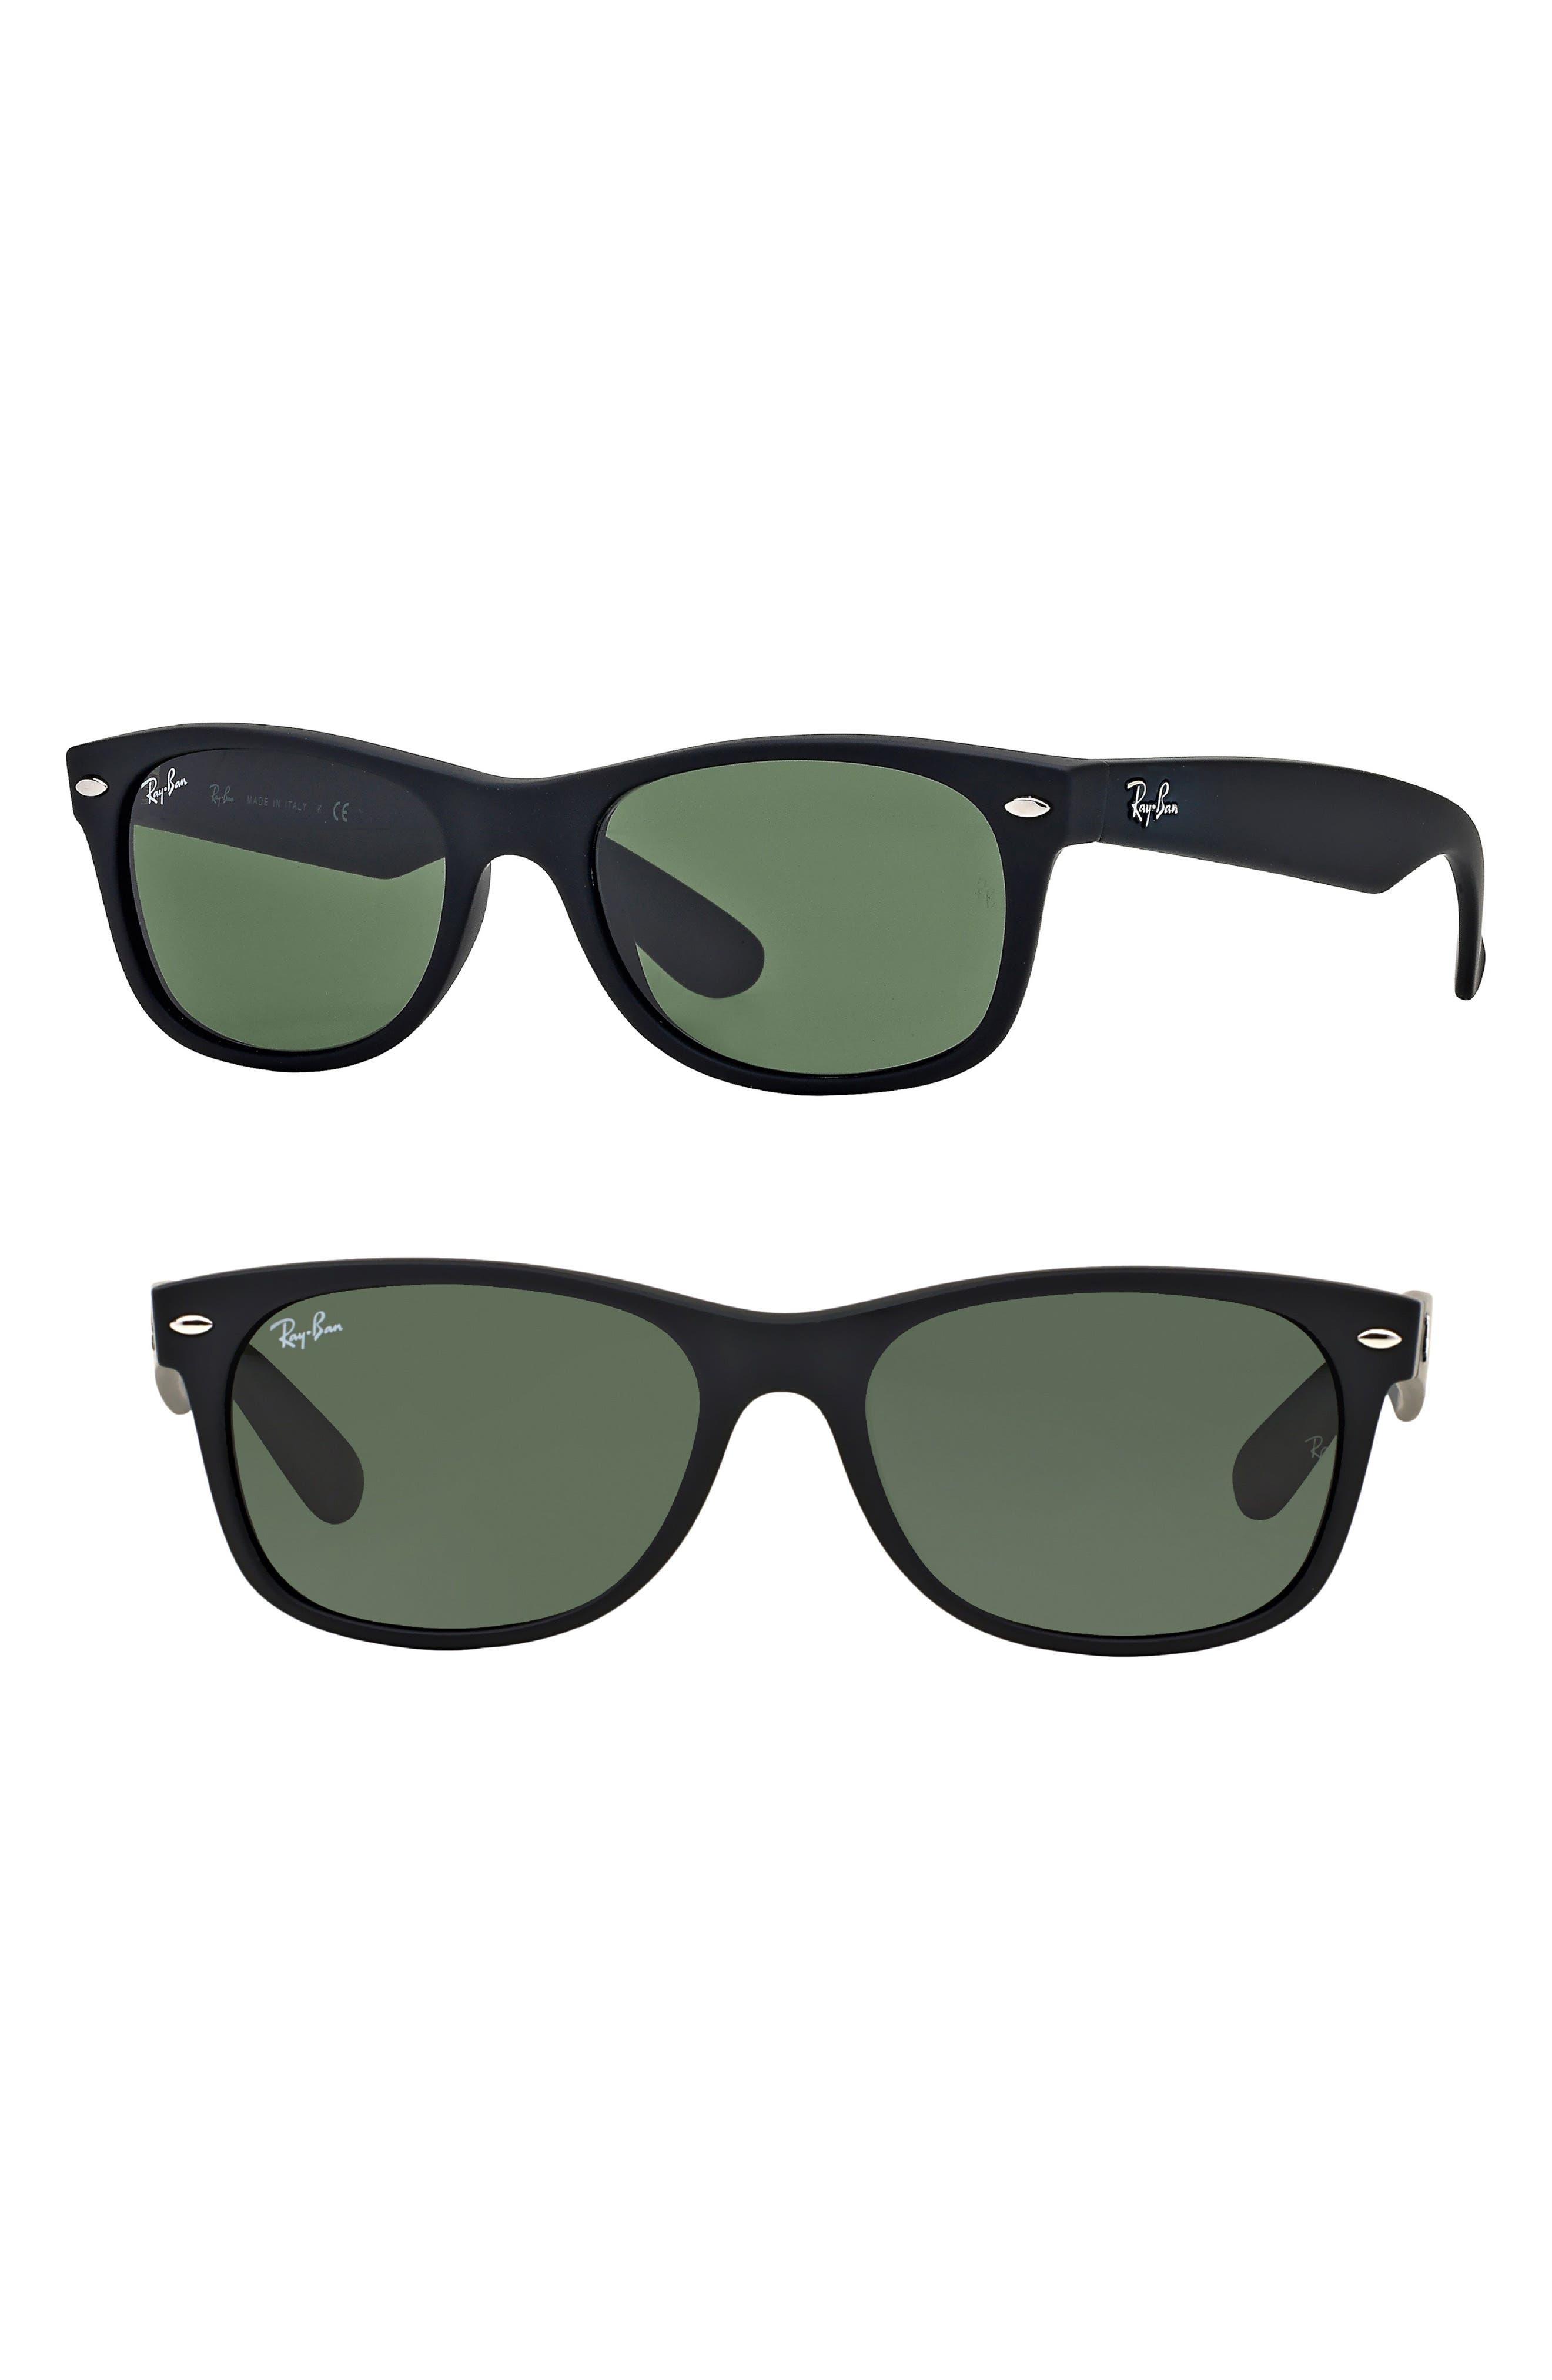 Ray-Ban Standard New Wayfarer 55Mm Sunglasses - Black Rubber